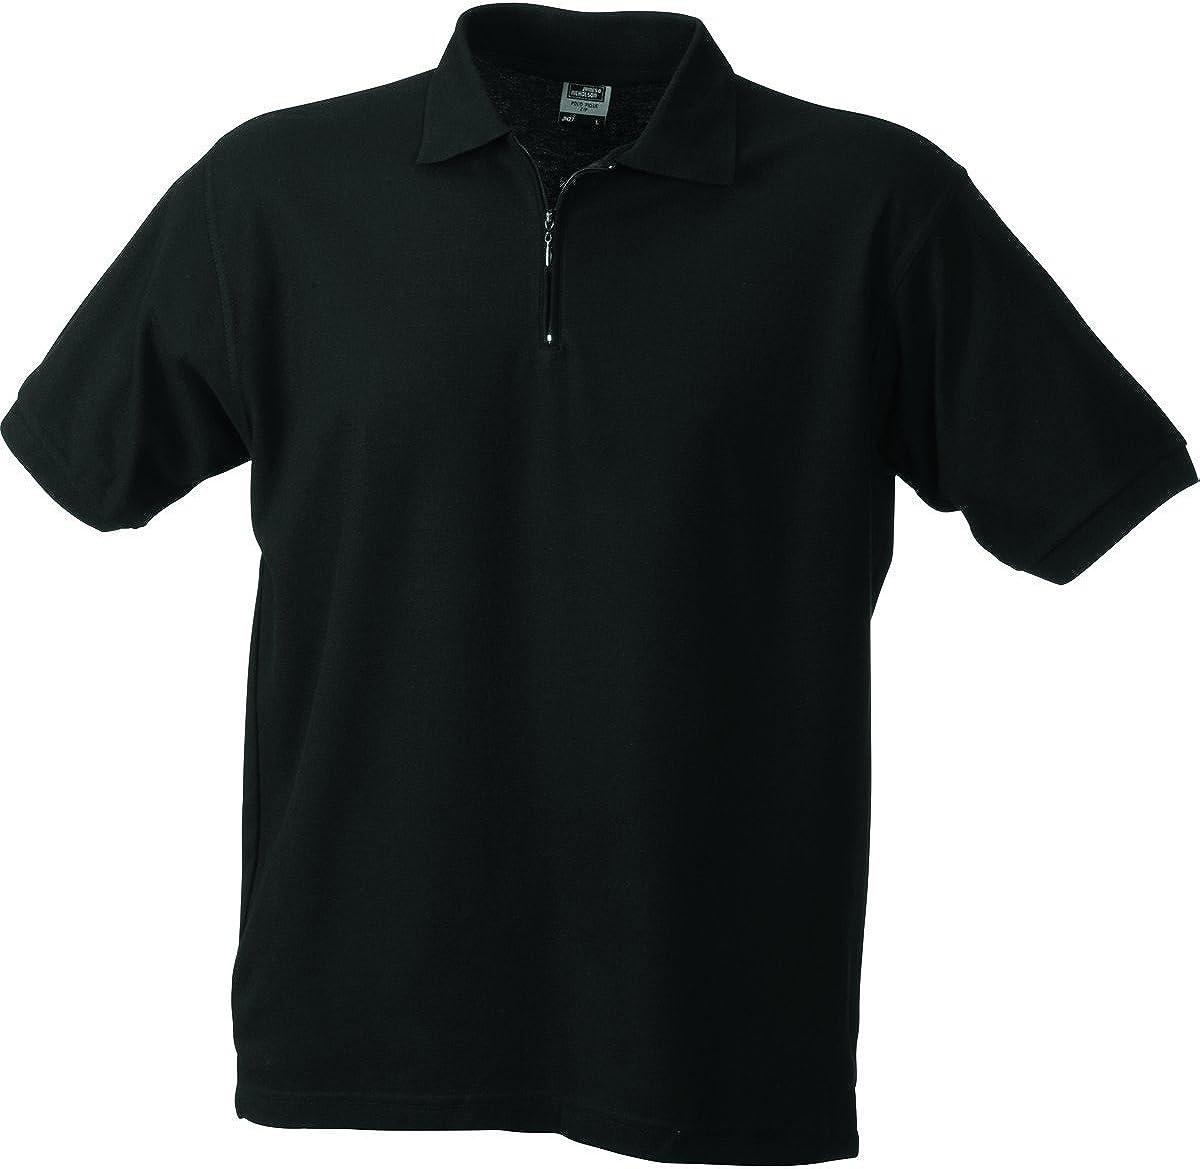 James /& Nicholson Mens Plain Short Sleeve Polo Shirt XXX-Large Black